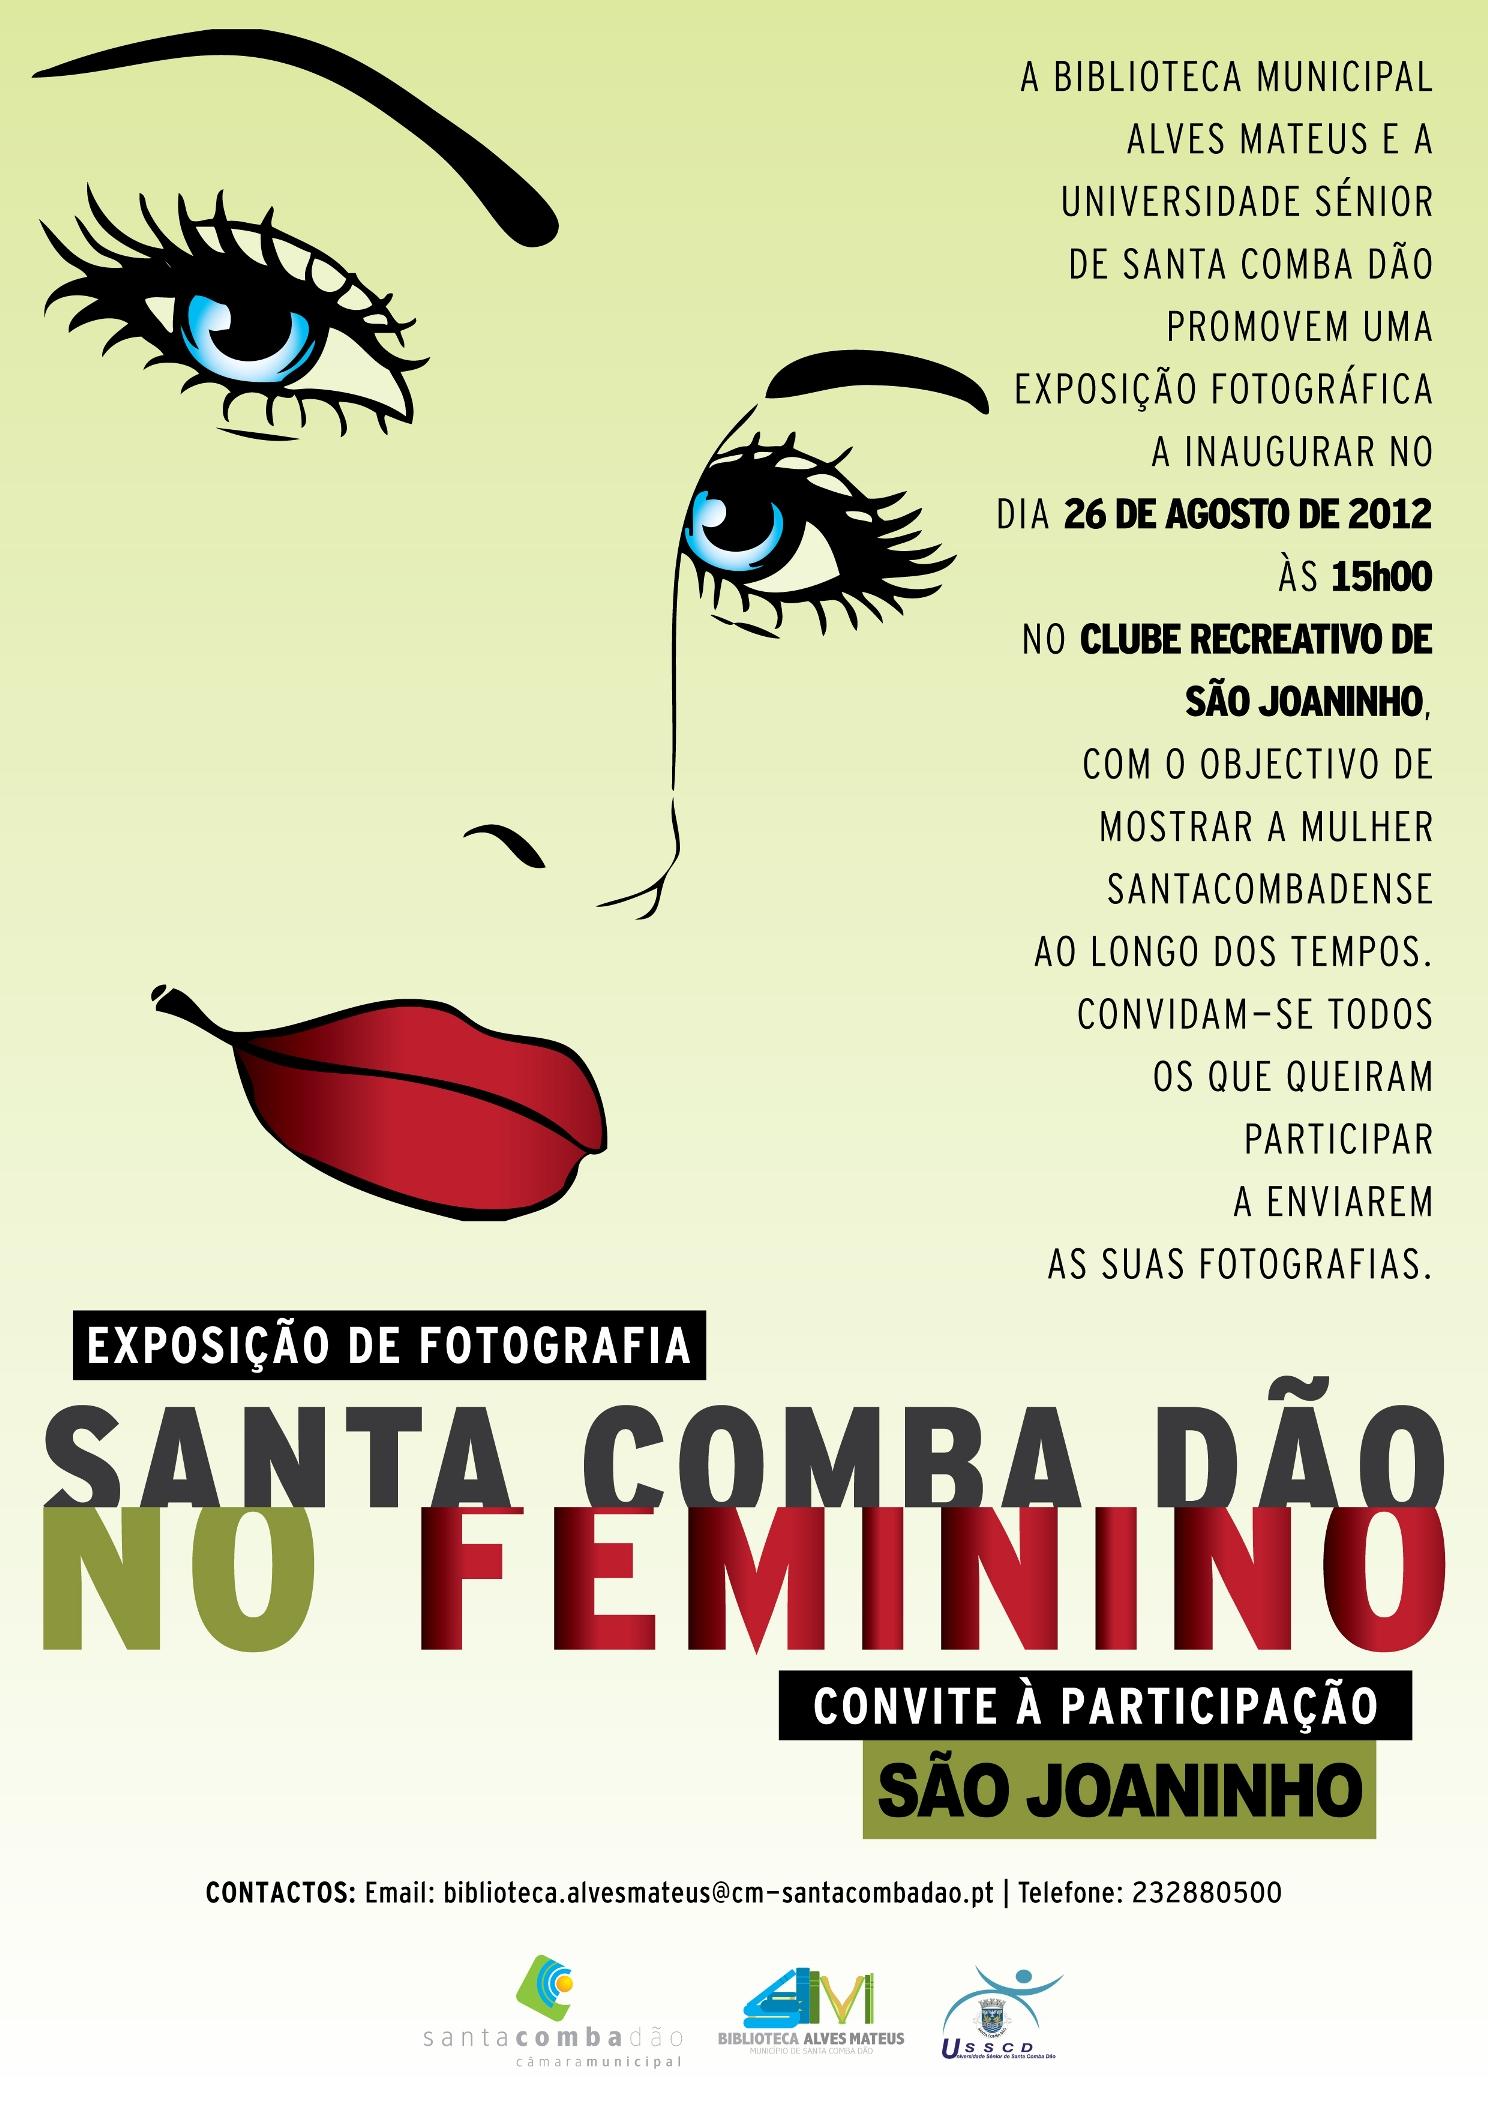 rostos_femininos_sao_joaninho-01